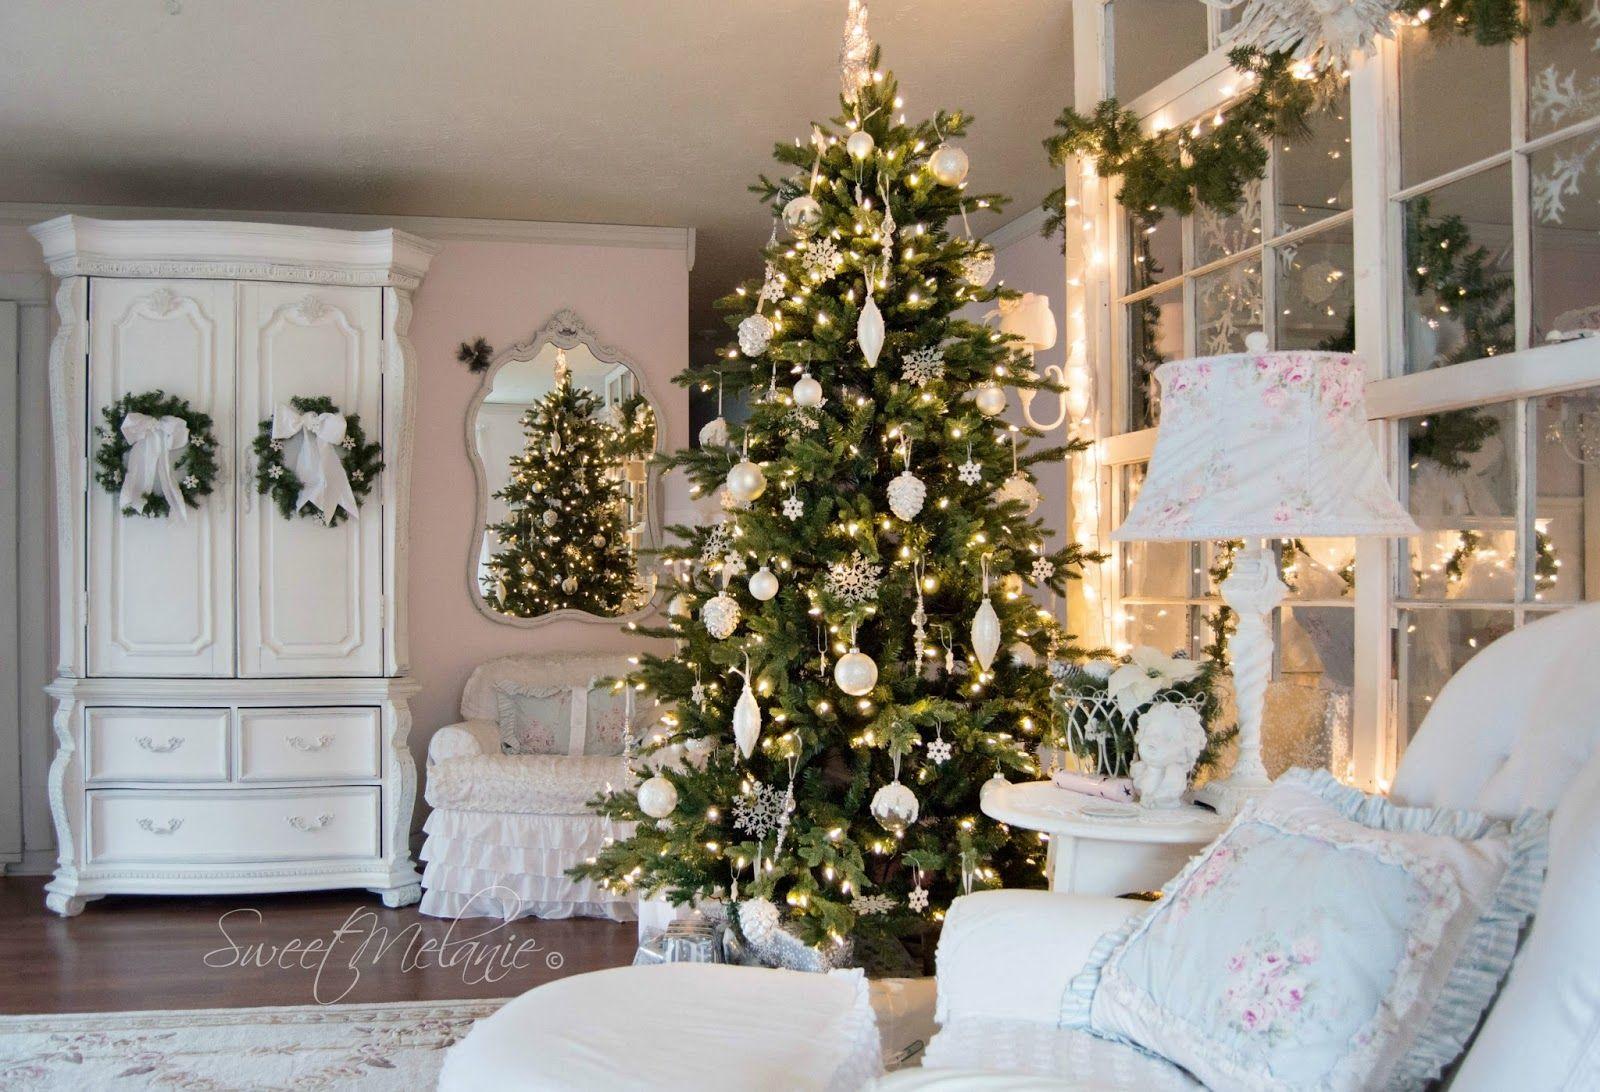 Shabby Chic Natale : Natale a casa di melanie huis versierings shabby